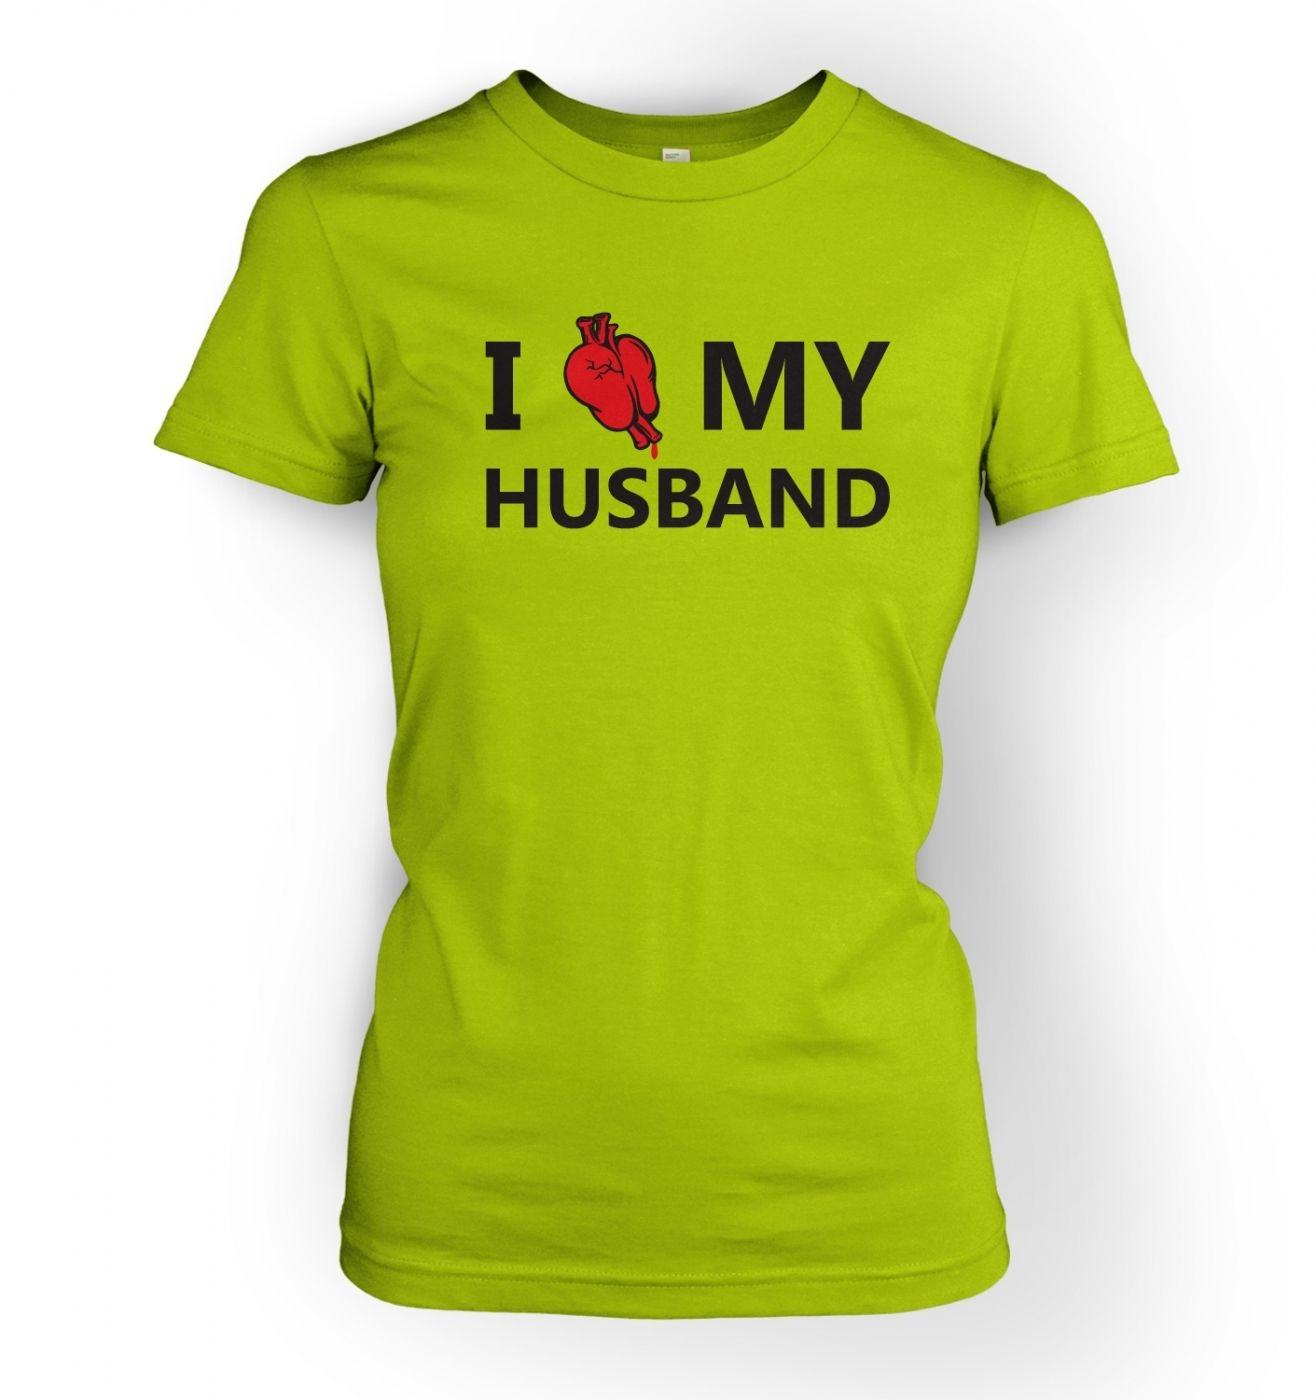 Women's I real heart my husband t-shirt